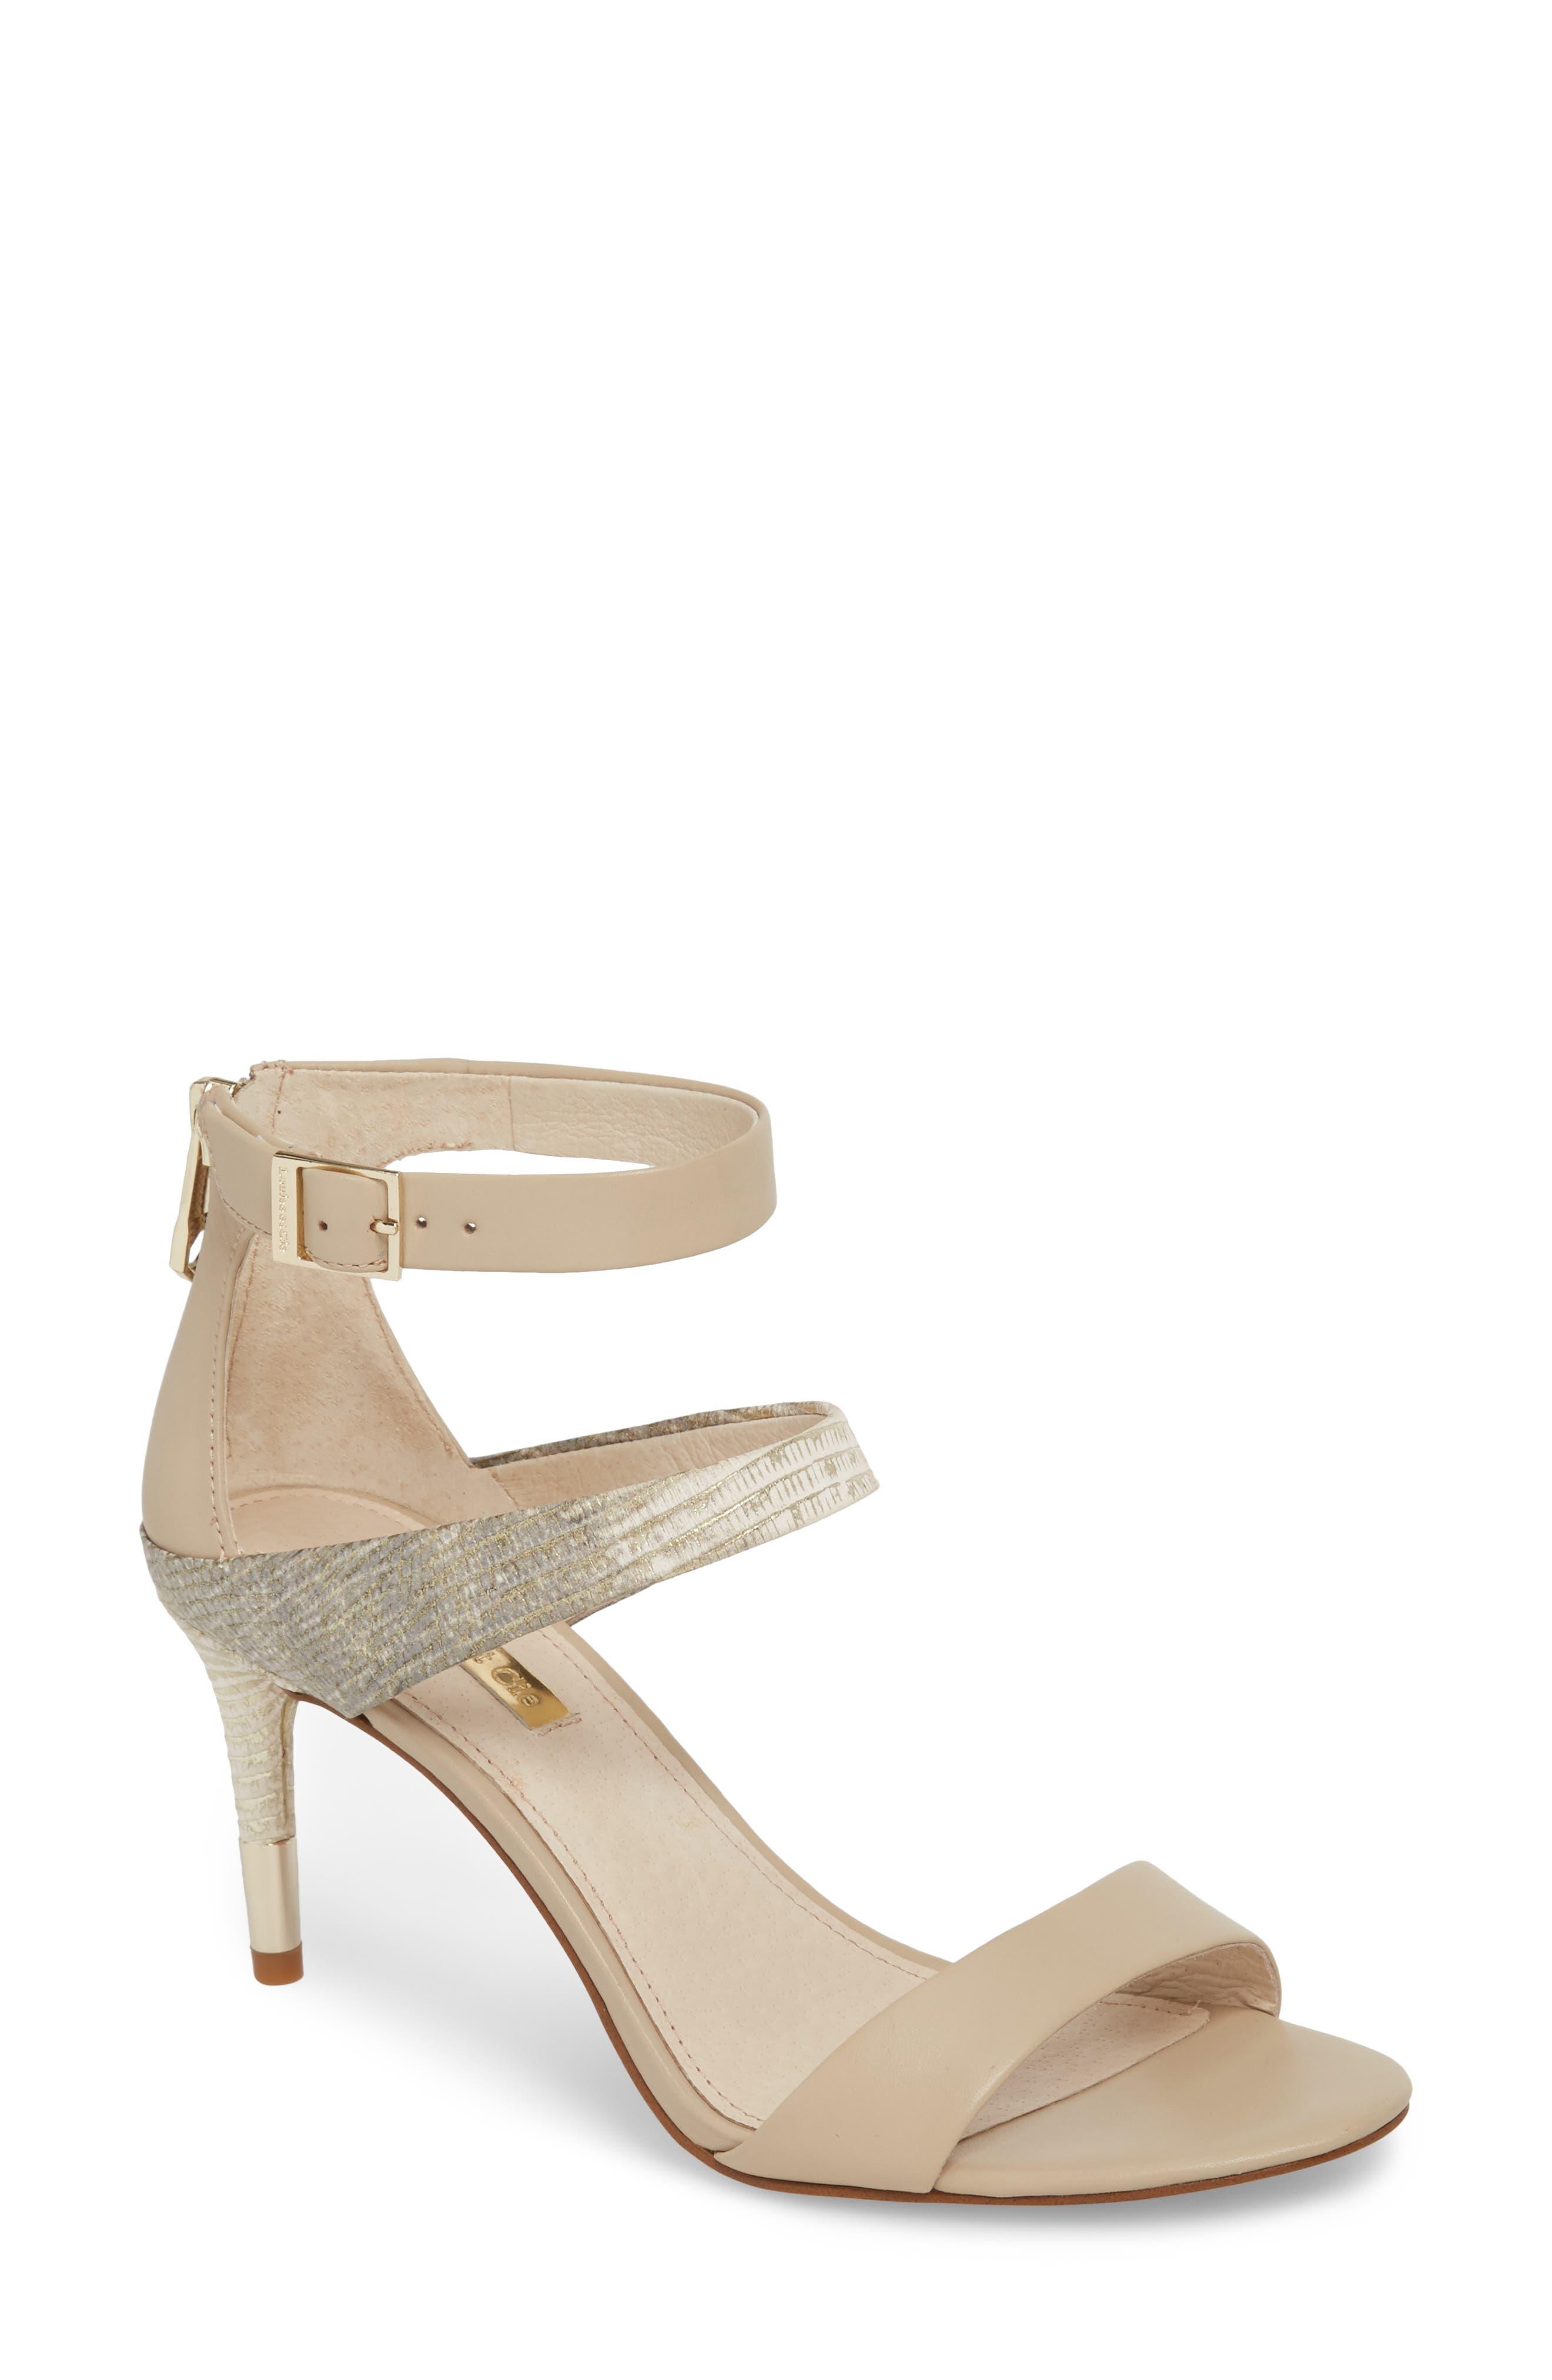 Louise et Cie Keit Strappy Sandal (Women)